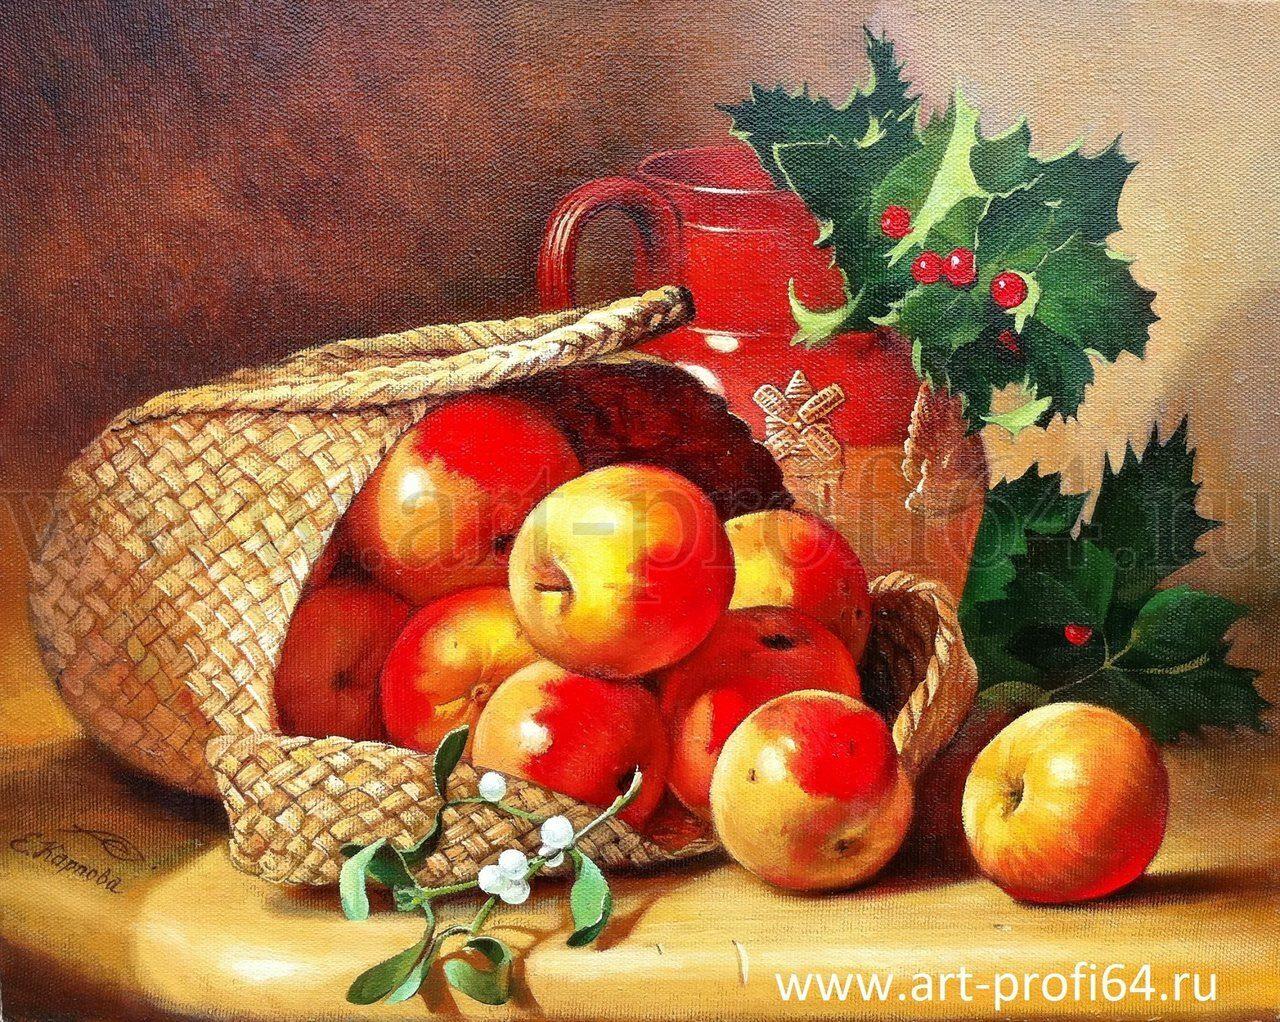 натюрморт с фруктами, живопись ...: art-profi64.ru/natyurmorty